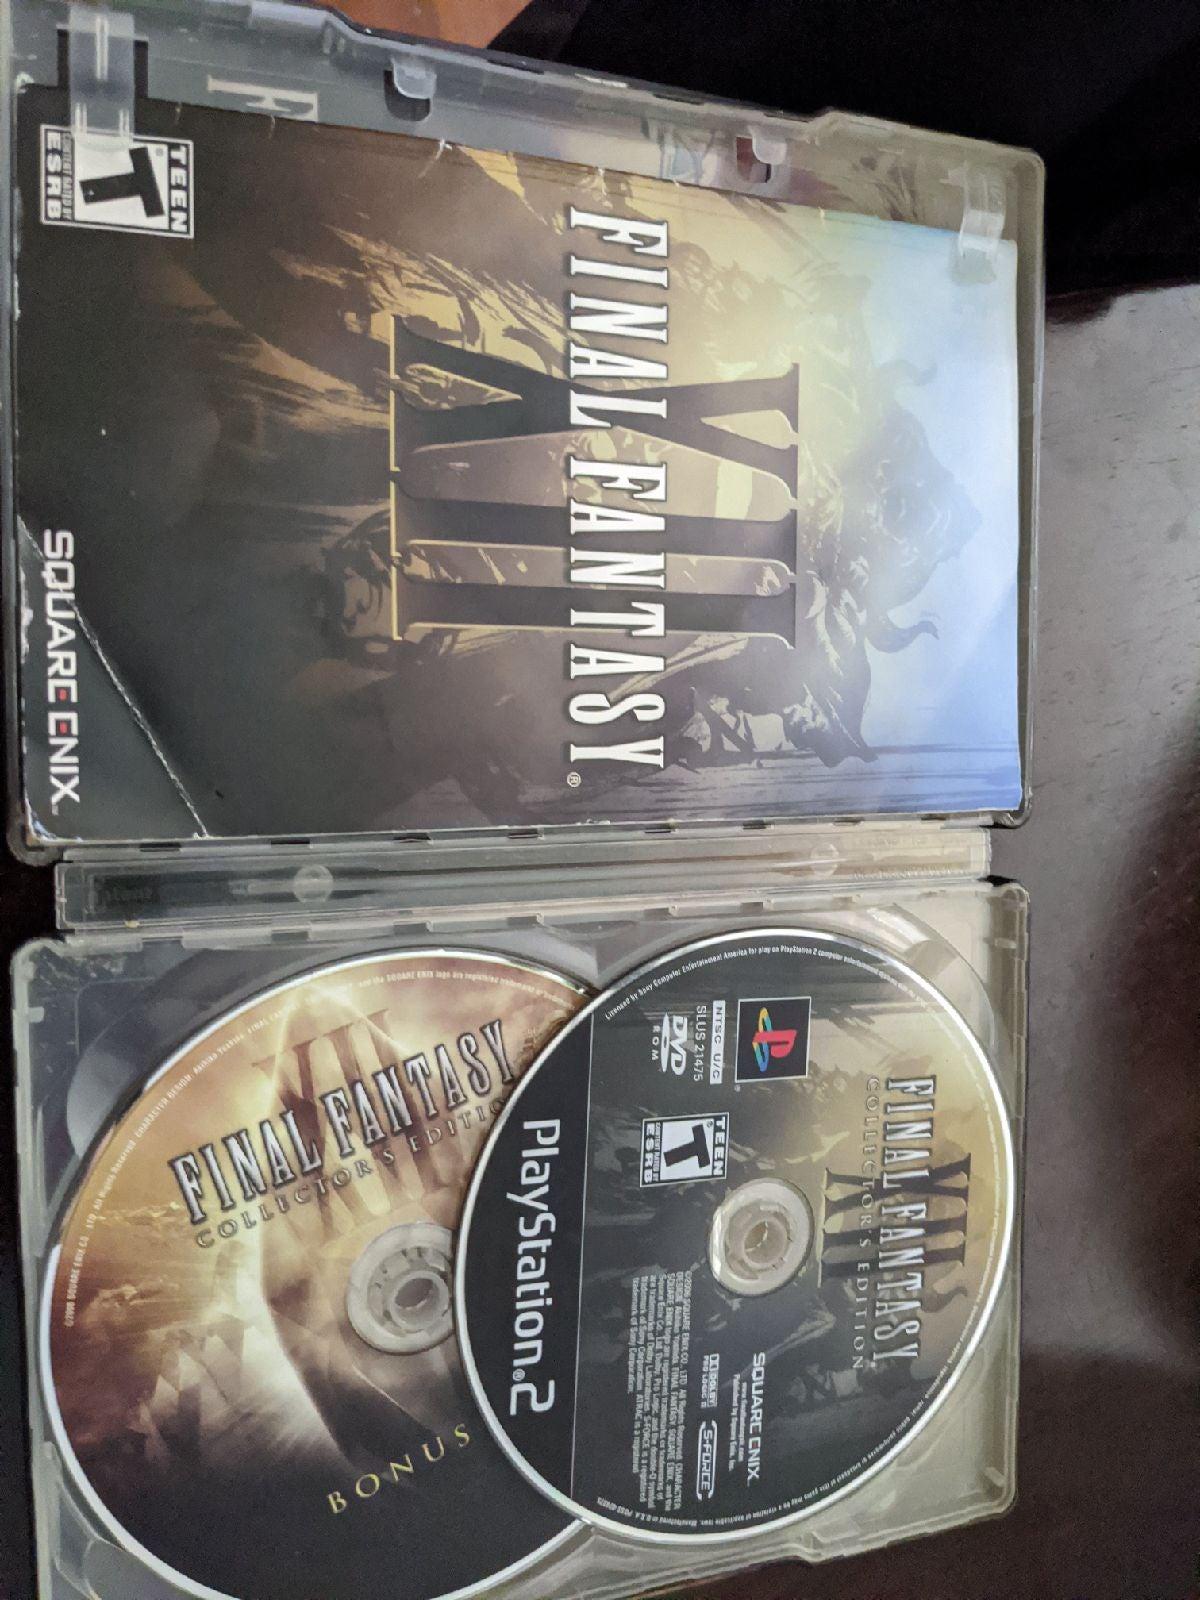 Final fantasy 12 Collector's Edition PS2